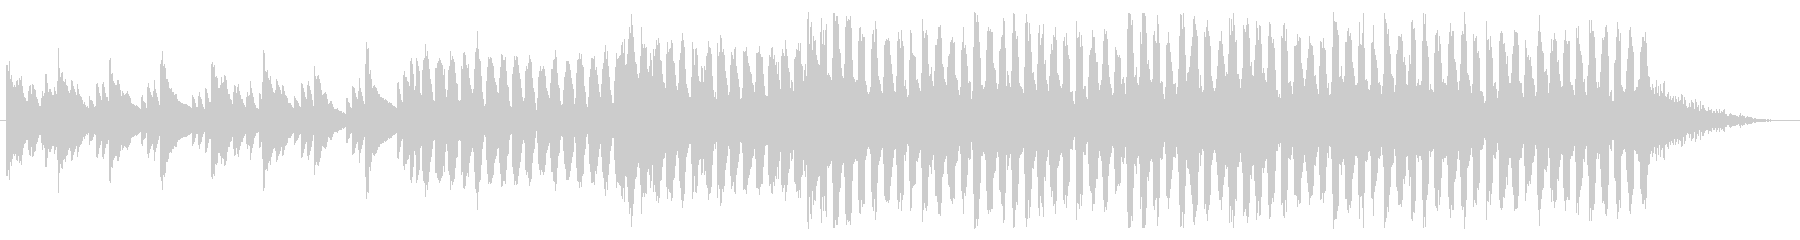 【EDM】ドライブする時に流れてそうな曲の未再生の波形